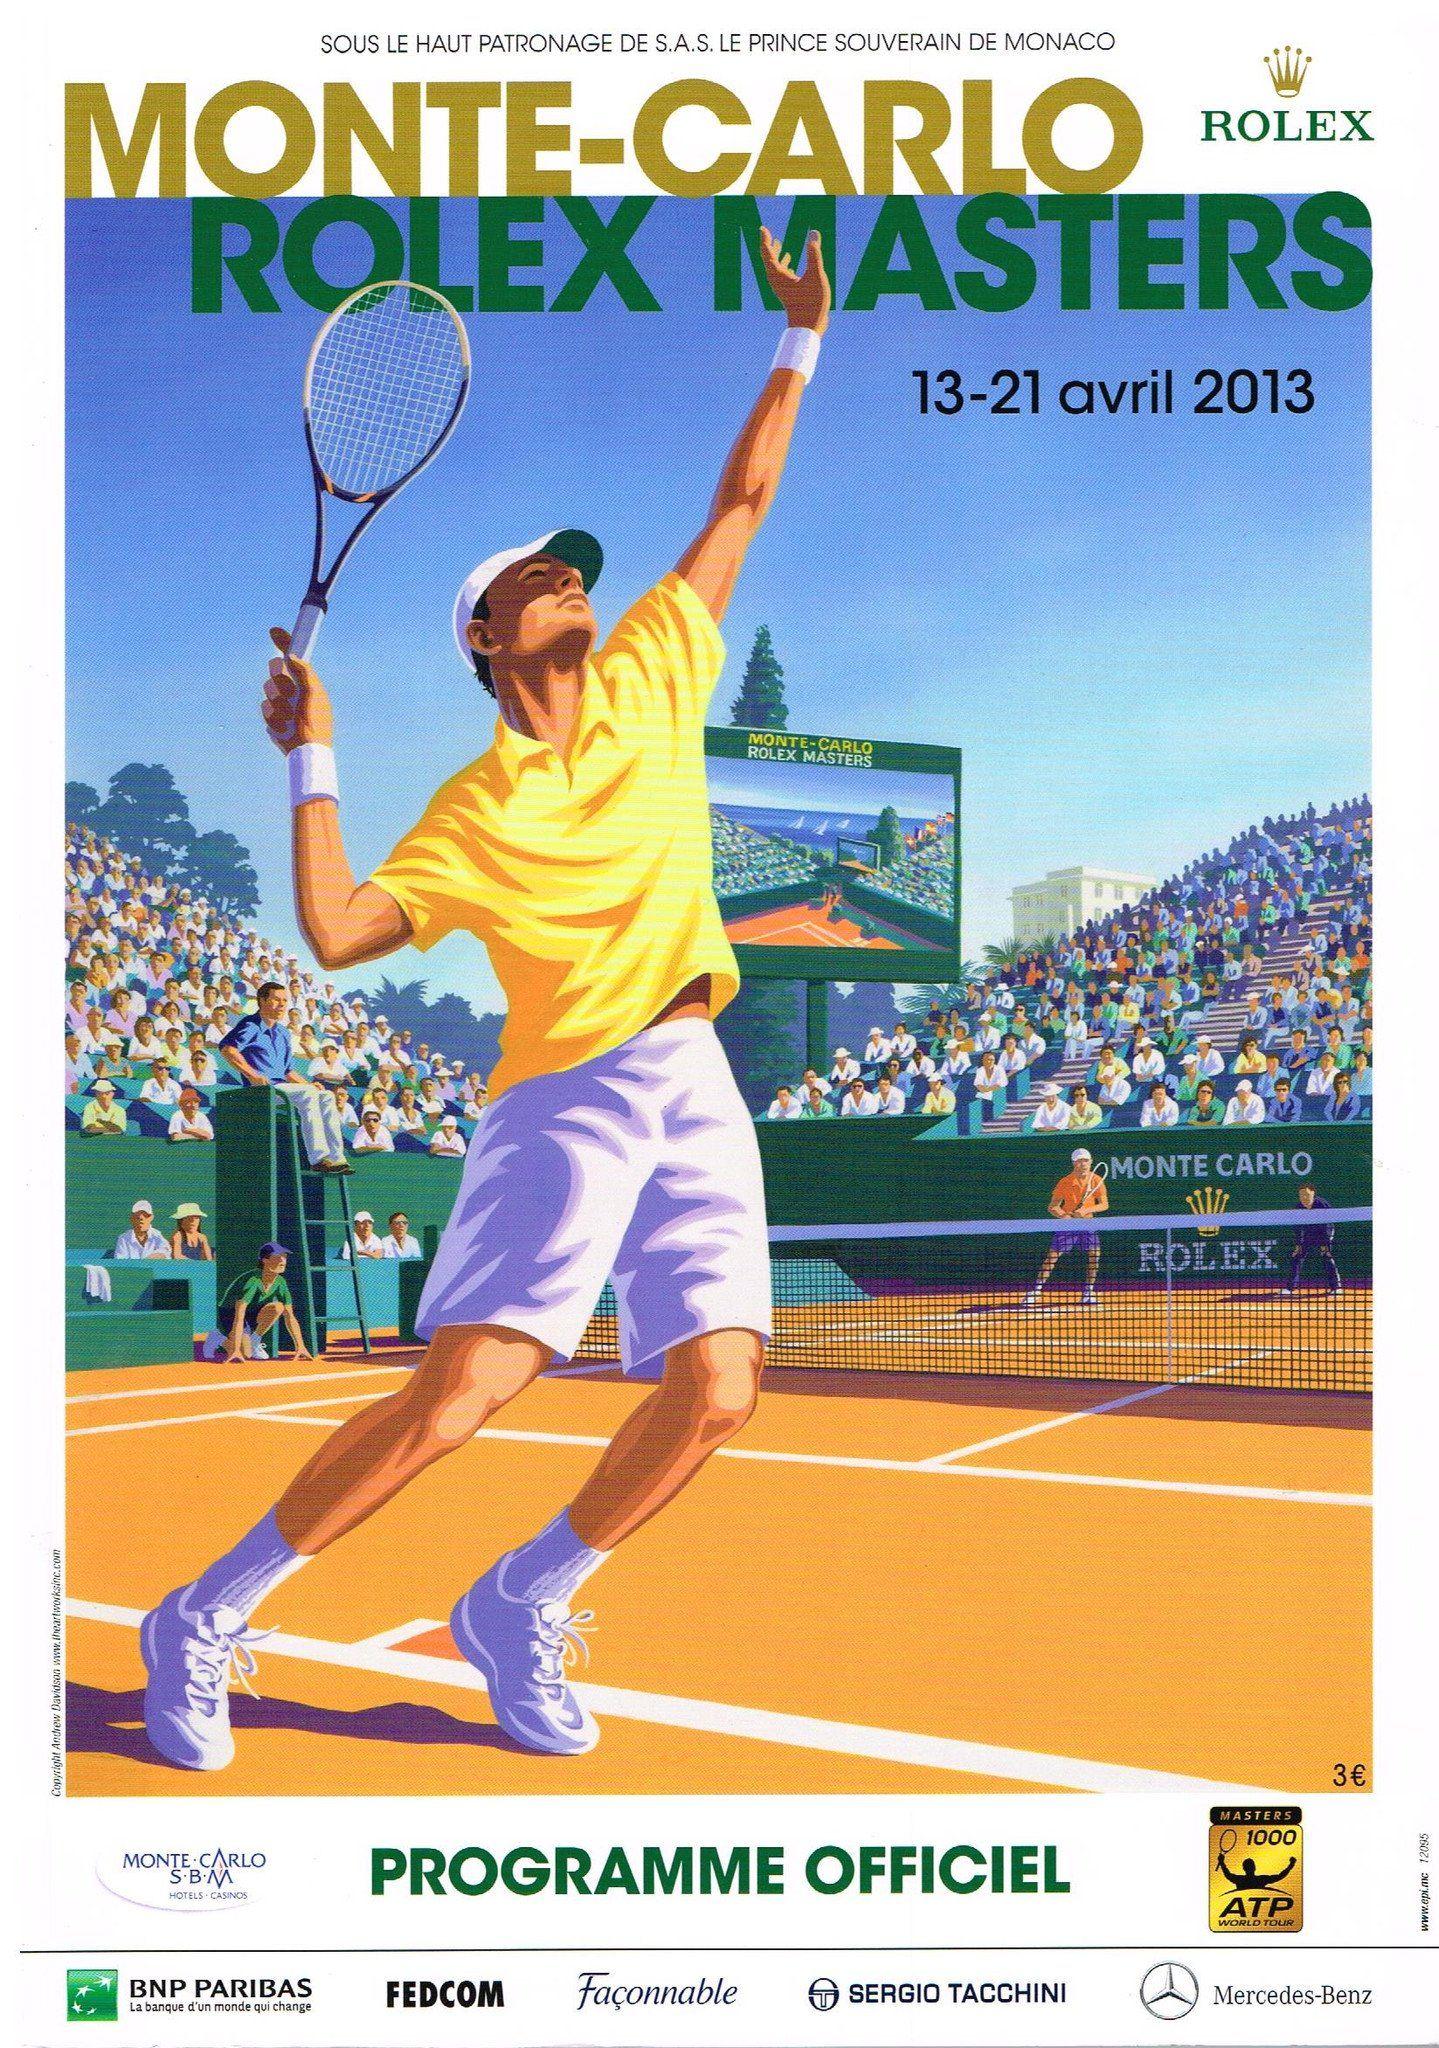 RAFAEL NADAL TENNIS LEGEND Photo Quality Poster Choose a Size B